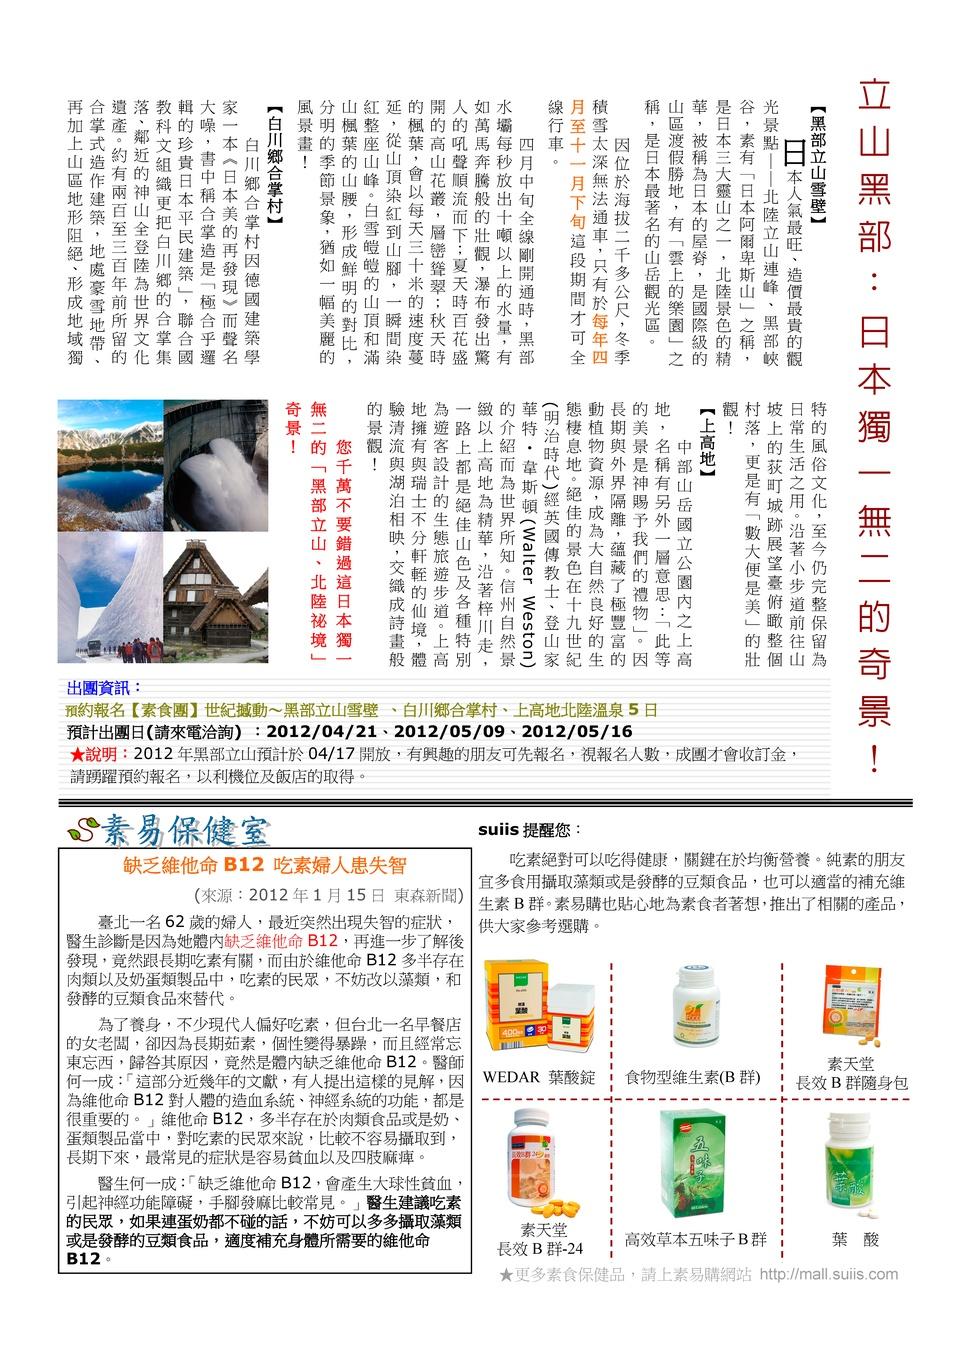 suiis 生活誌-2012-02_Page_2